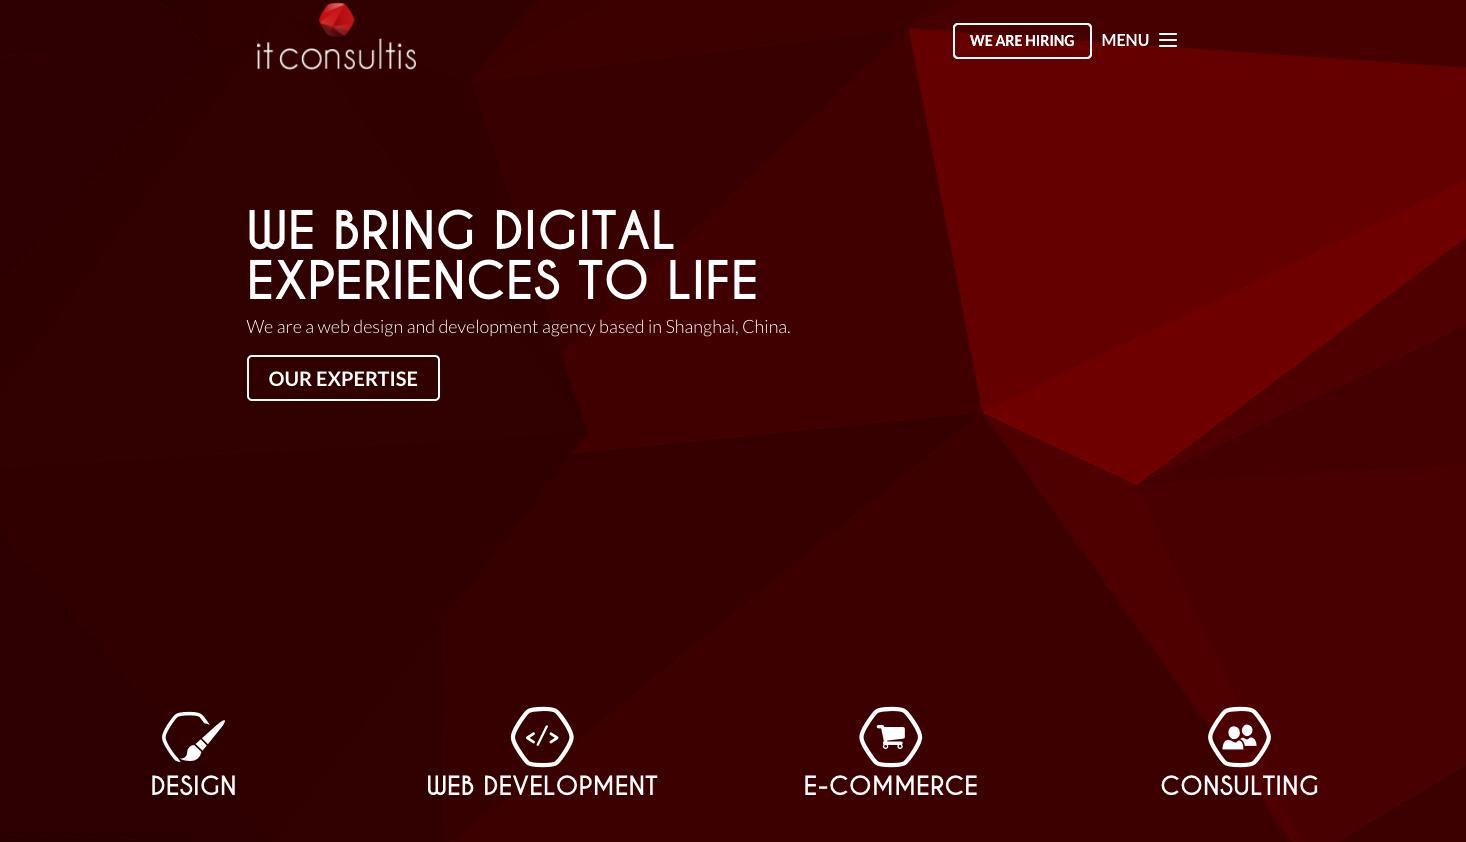 IT Consultis - Shangai - Agency - Digital